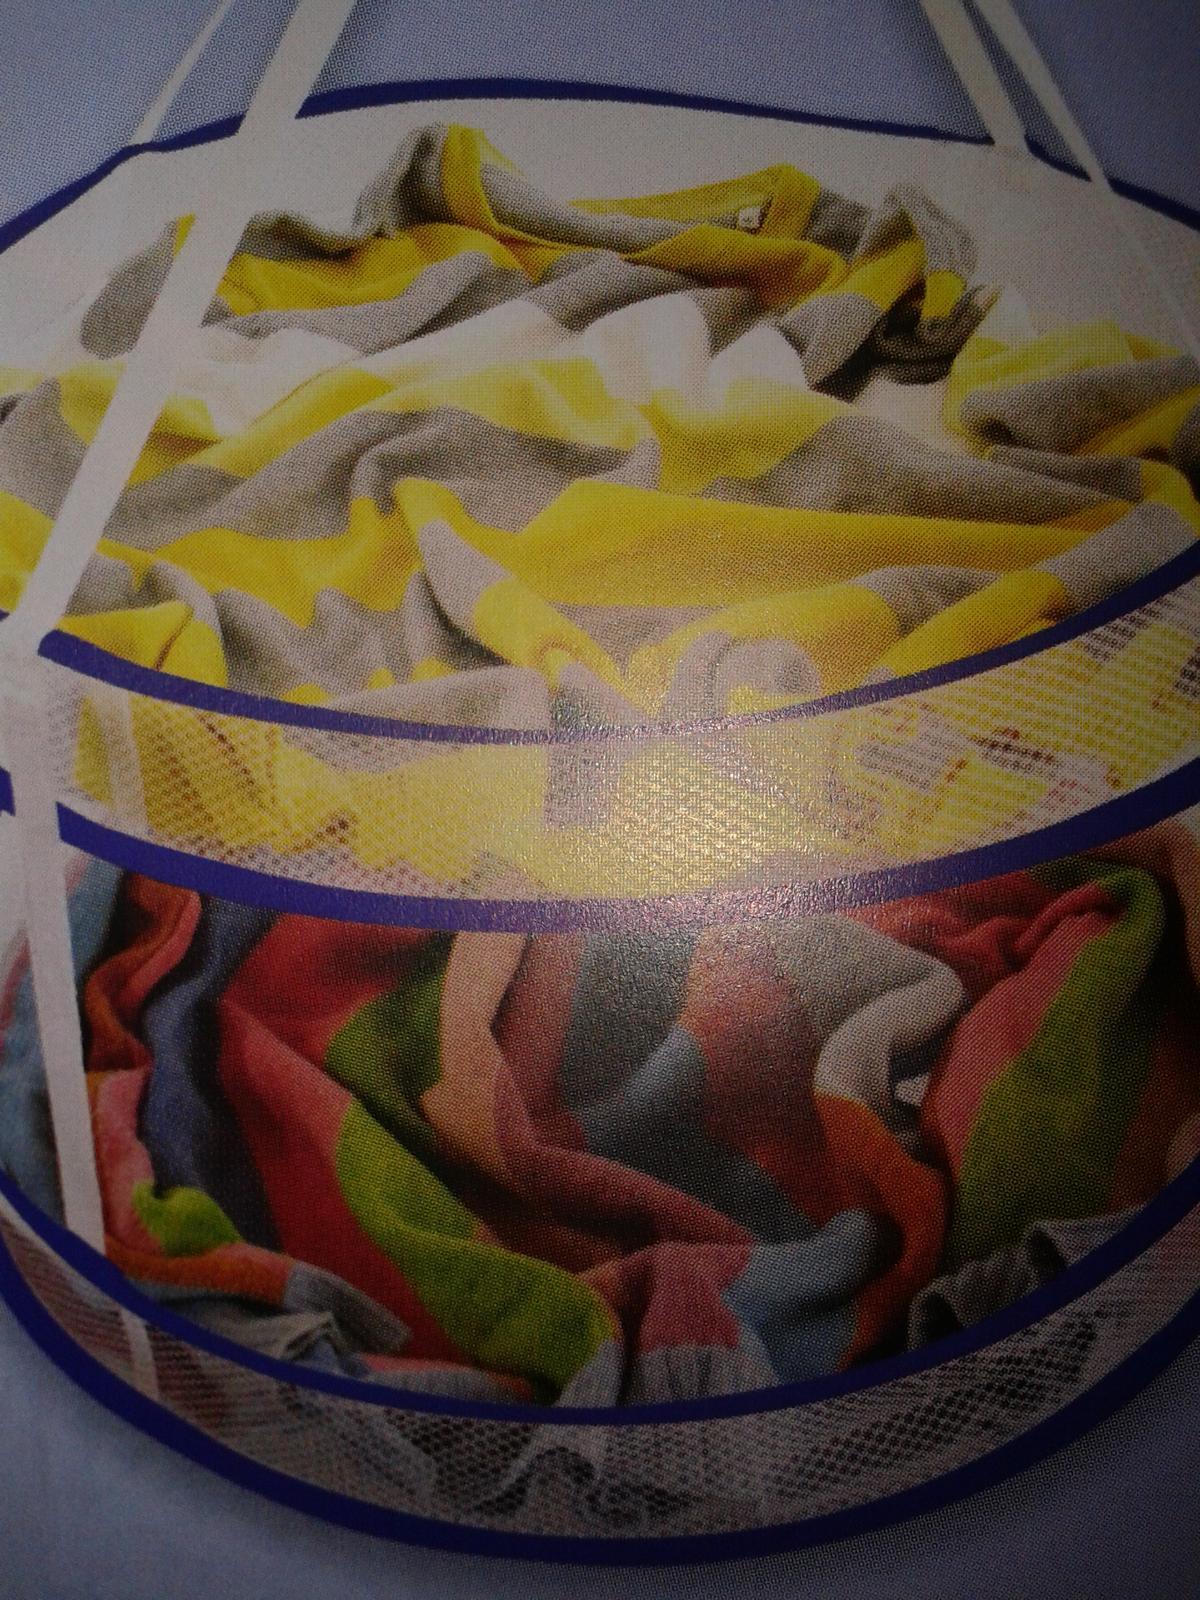 Sušiak na jemne prádlo nepoužitý - Obrázok č. 1